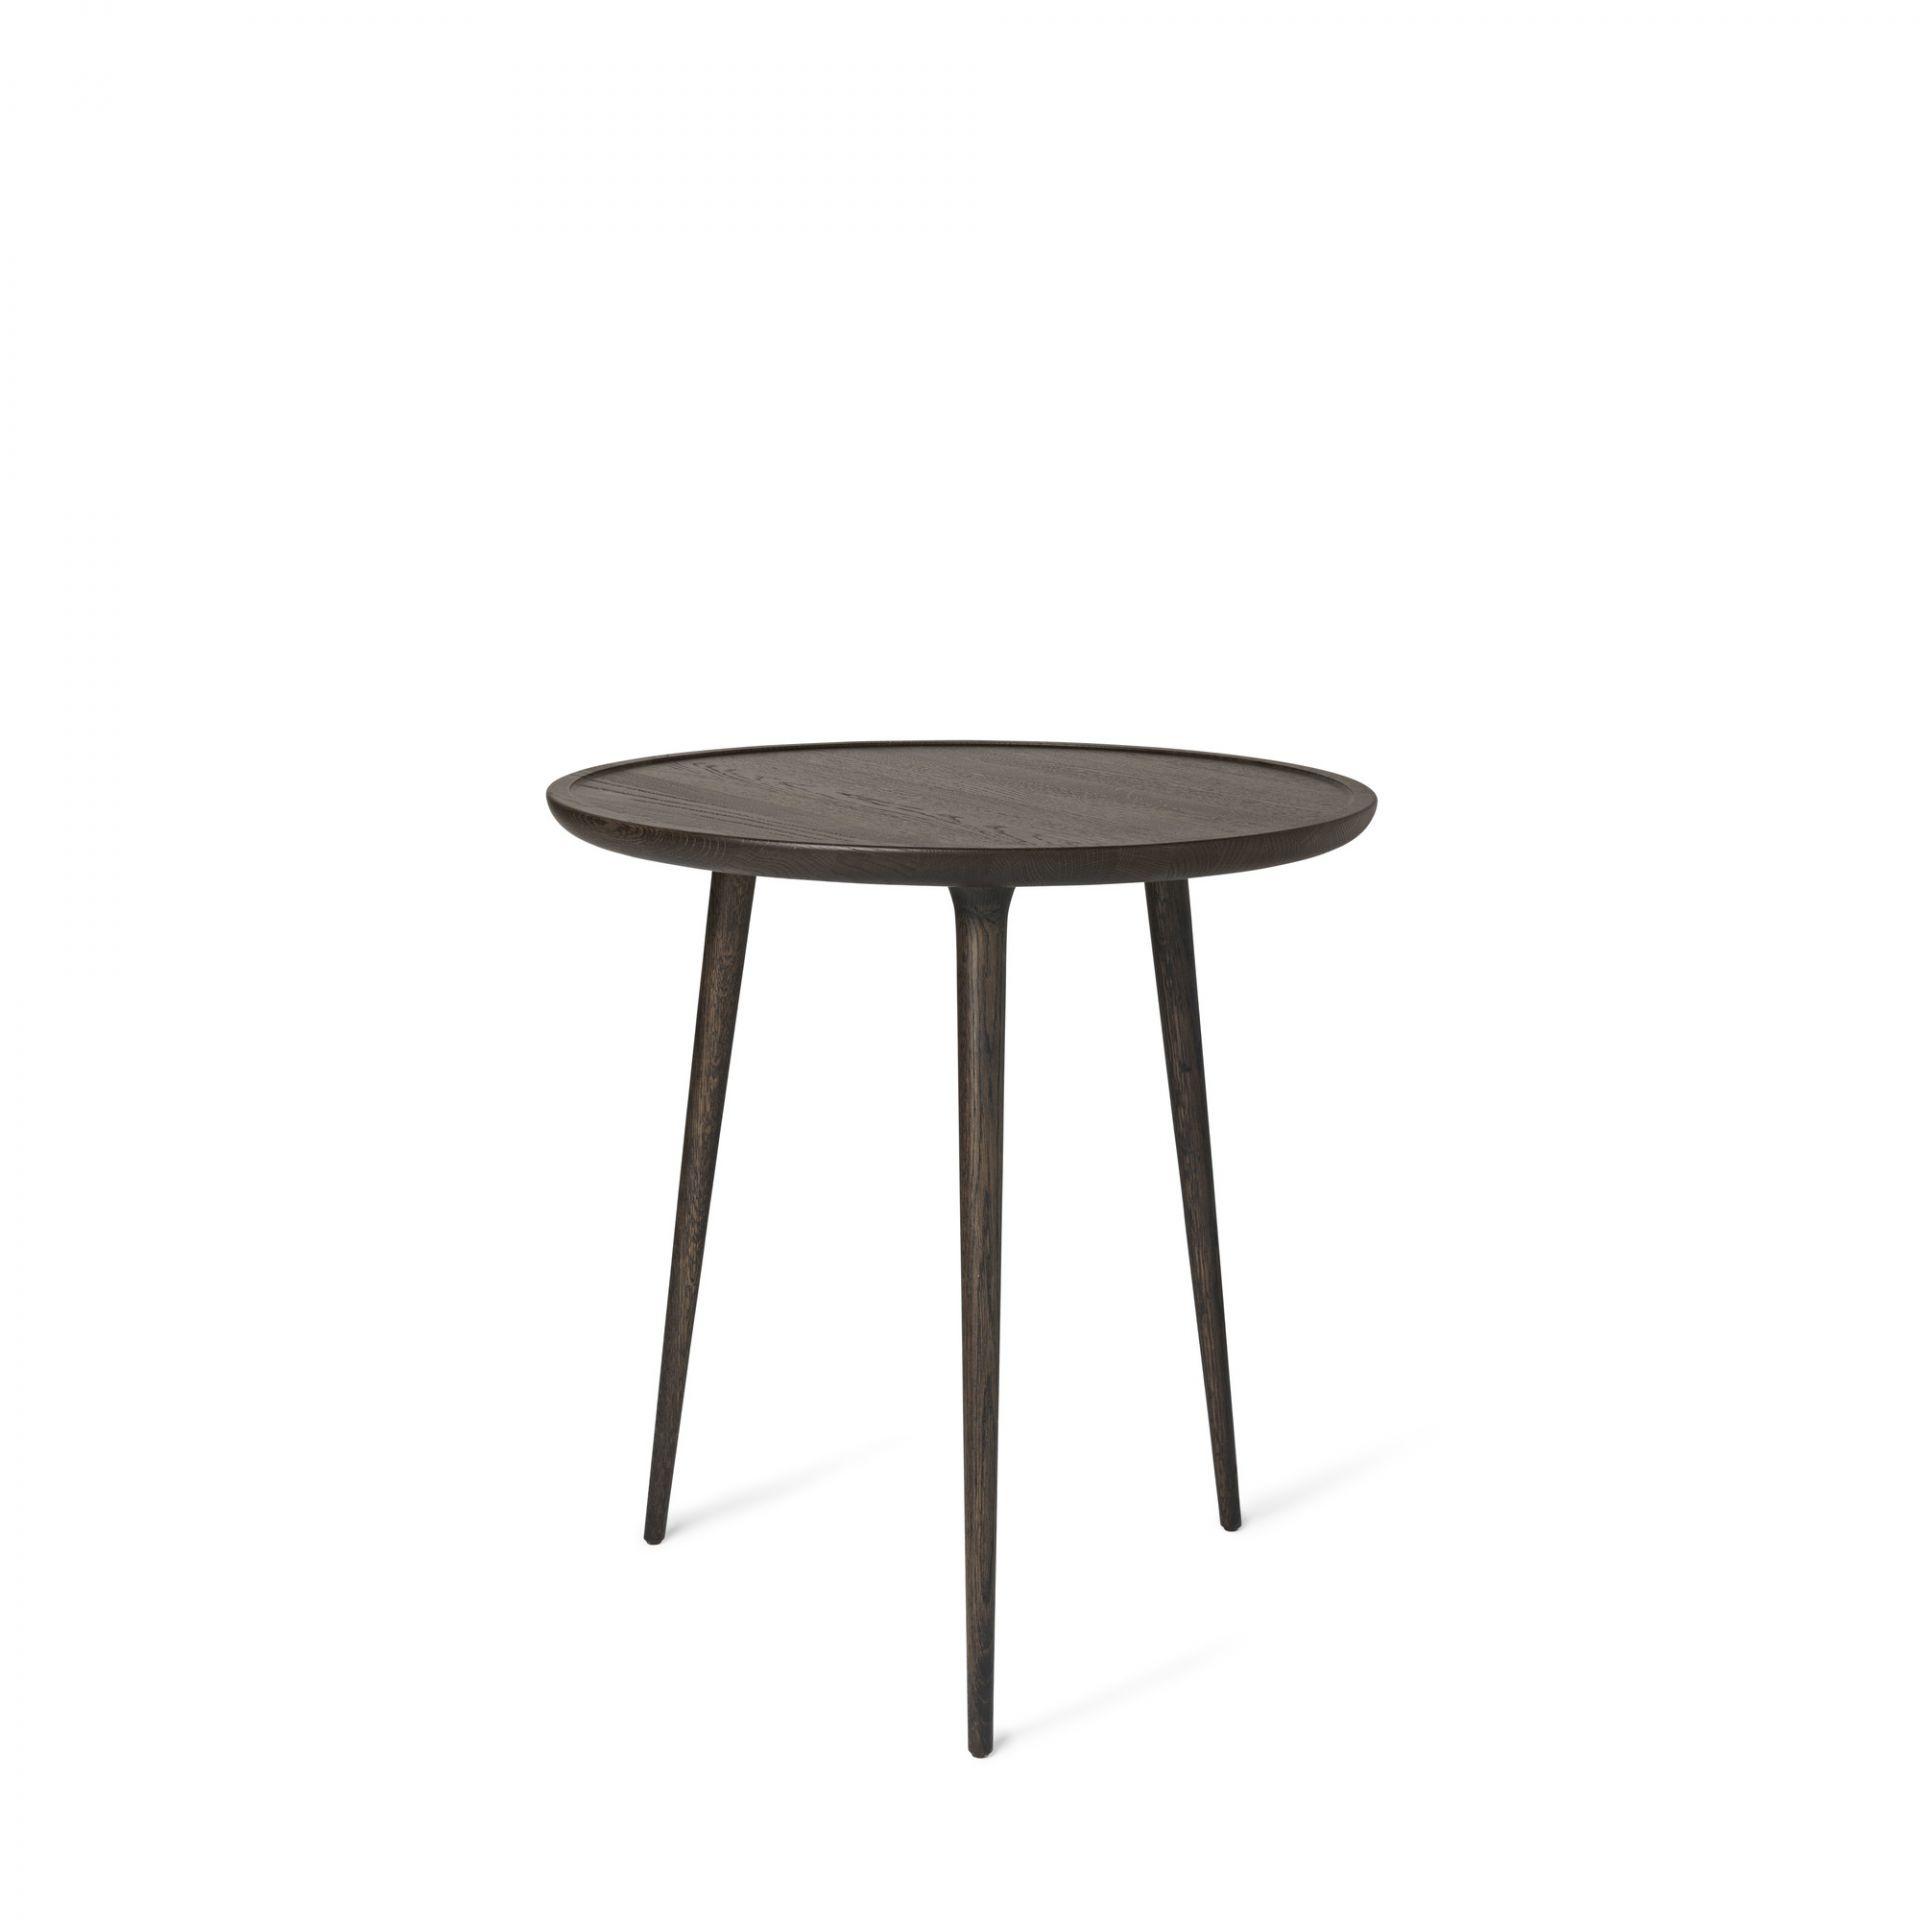 Accent Cafe Table Eiche Sirka grau Mater